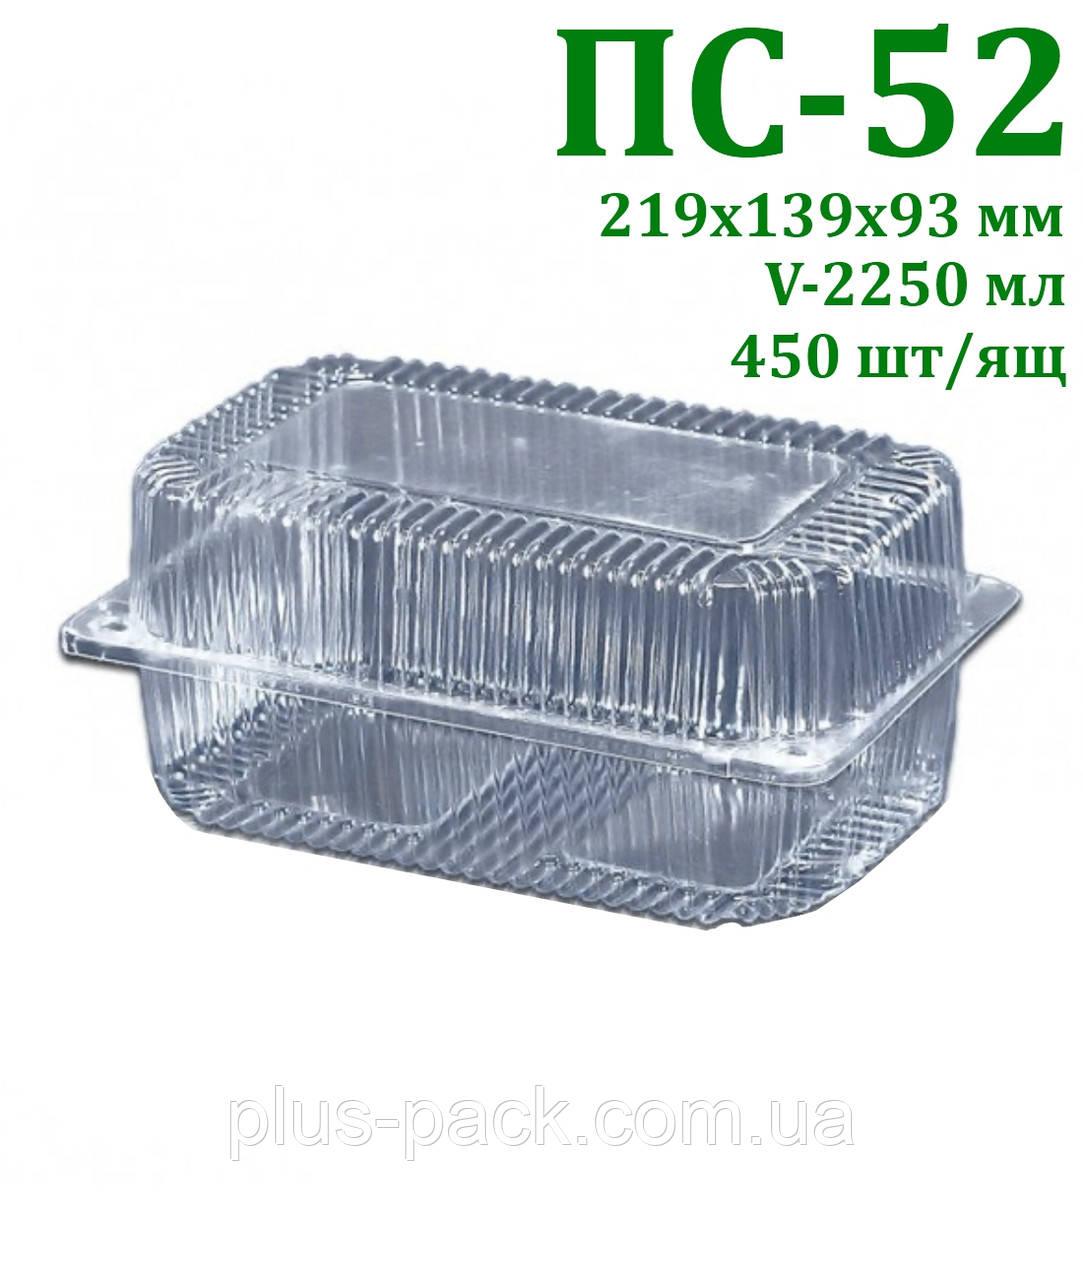 Пищевой Контейнер Одноразовый 219х139х93мм, 2250 мл